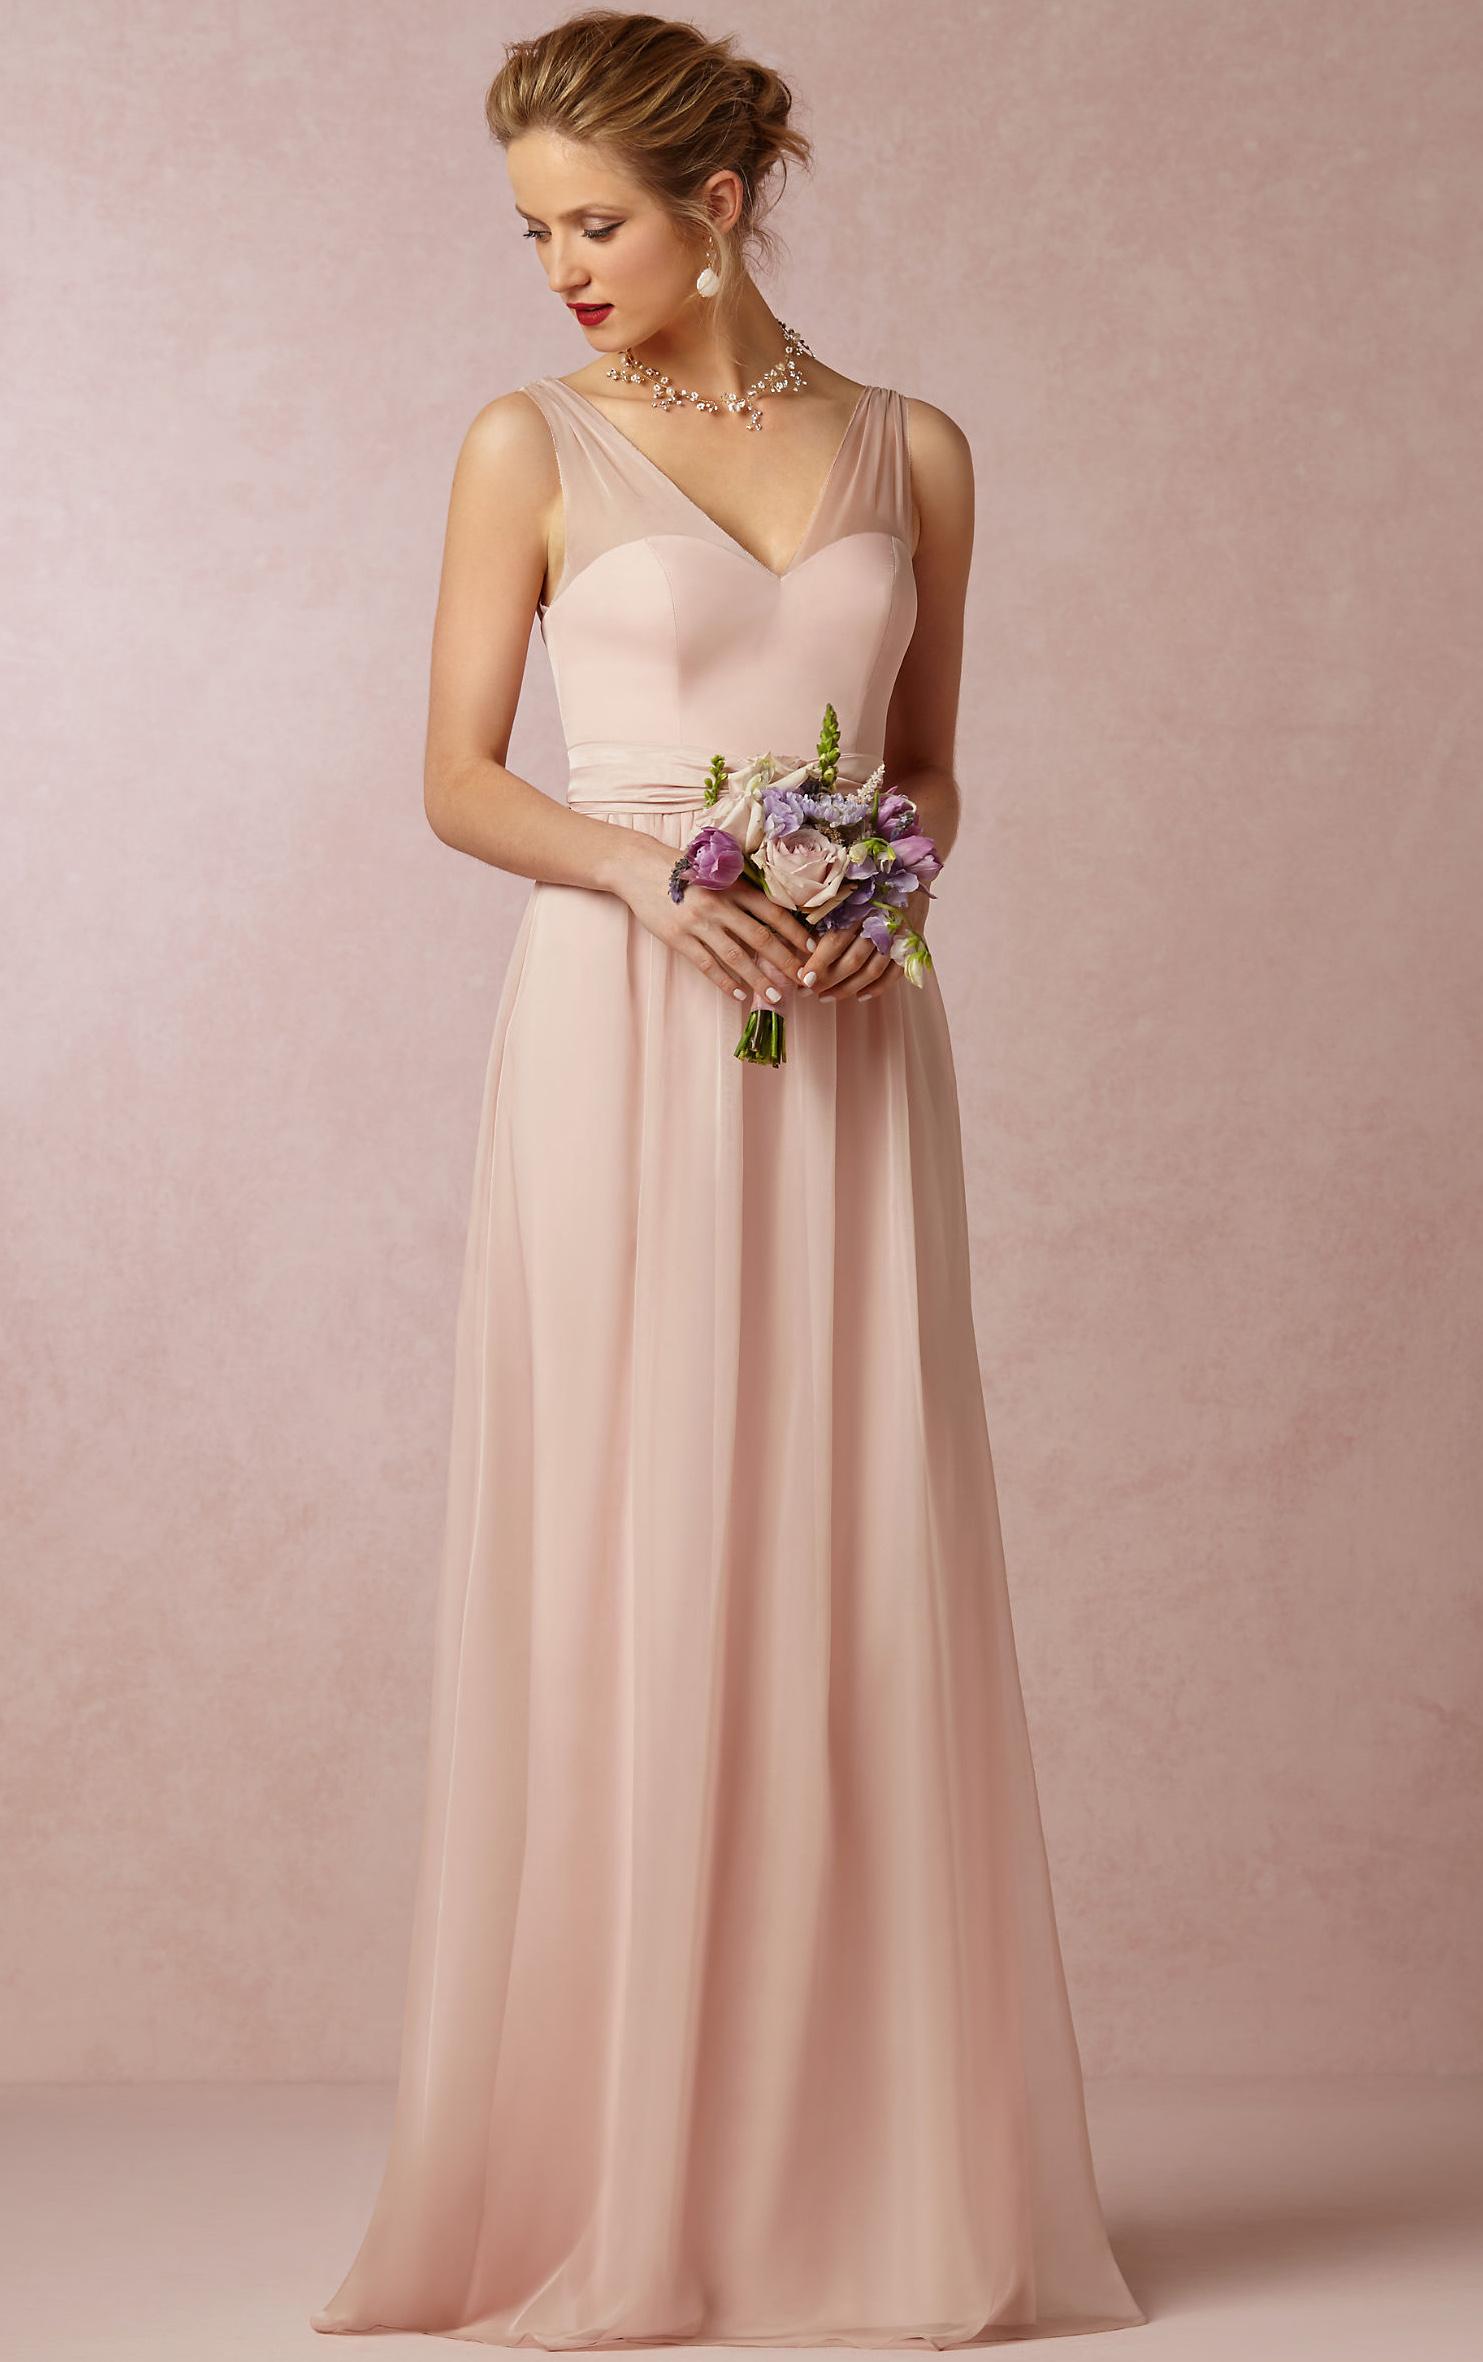 V-neck A-line Sleeveless Natural Floor-length pink bridesmaid dress